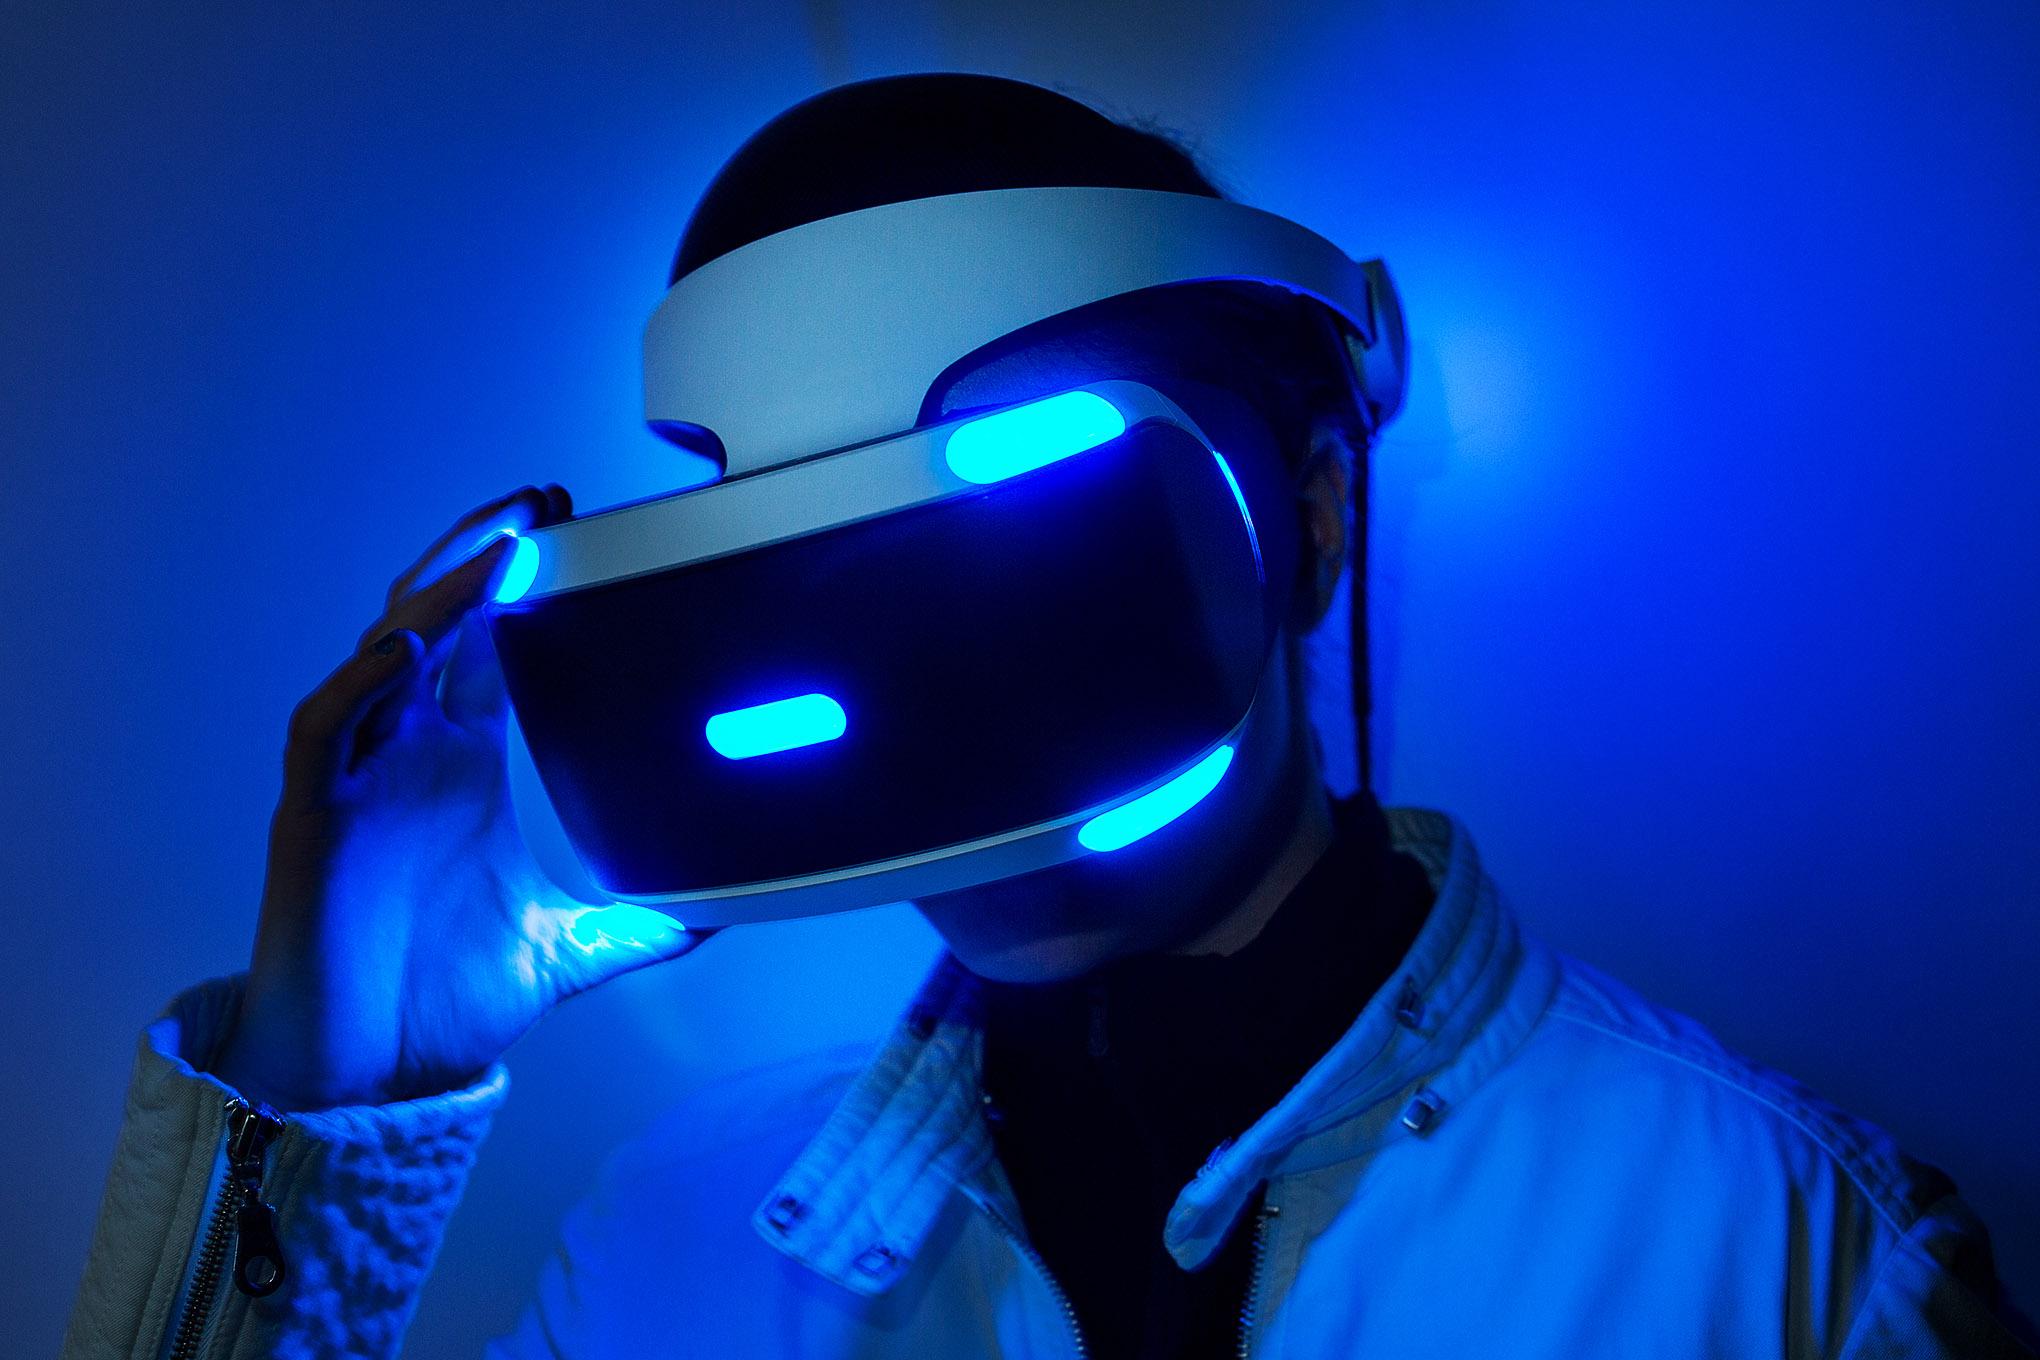 Playstation VR in use.https://movietvtechgeeks.com